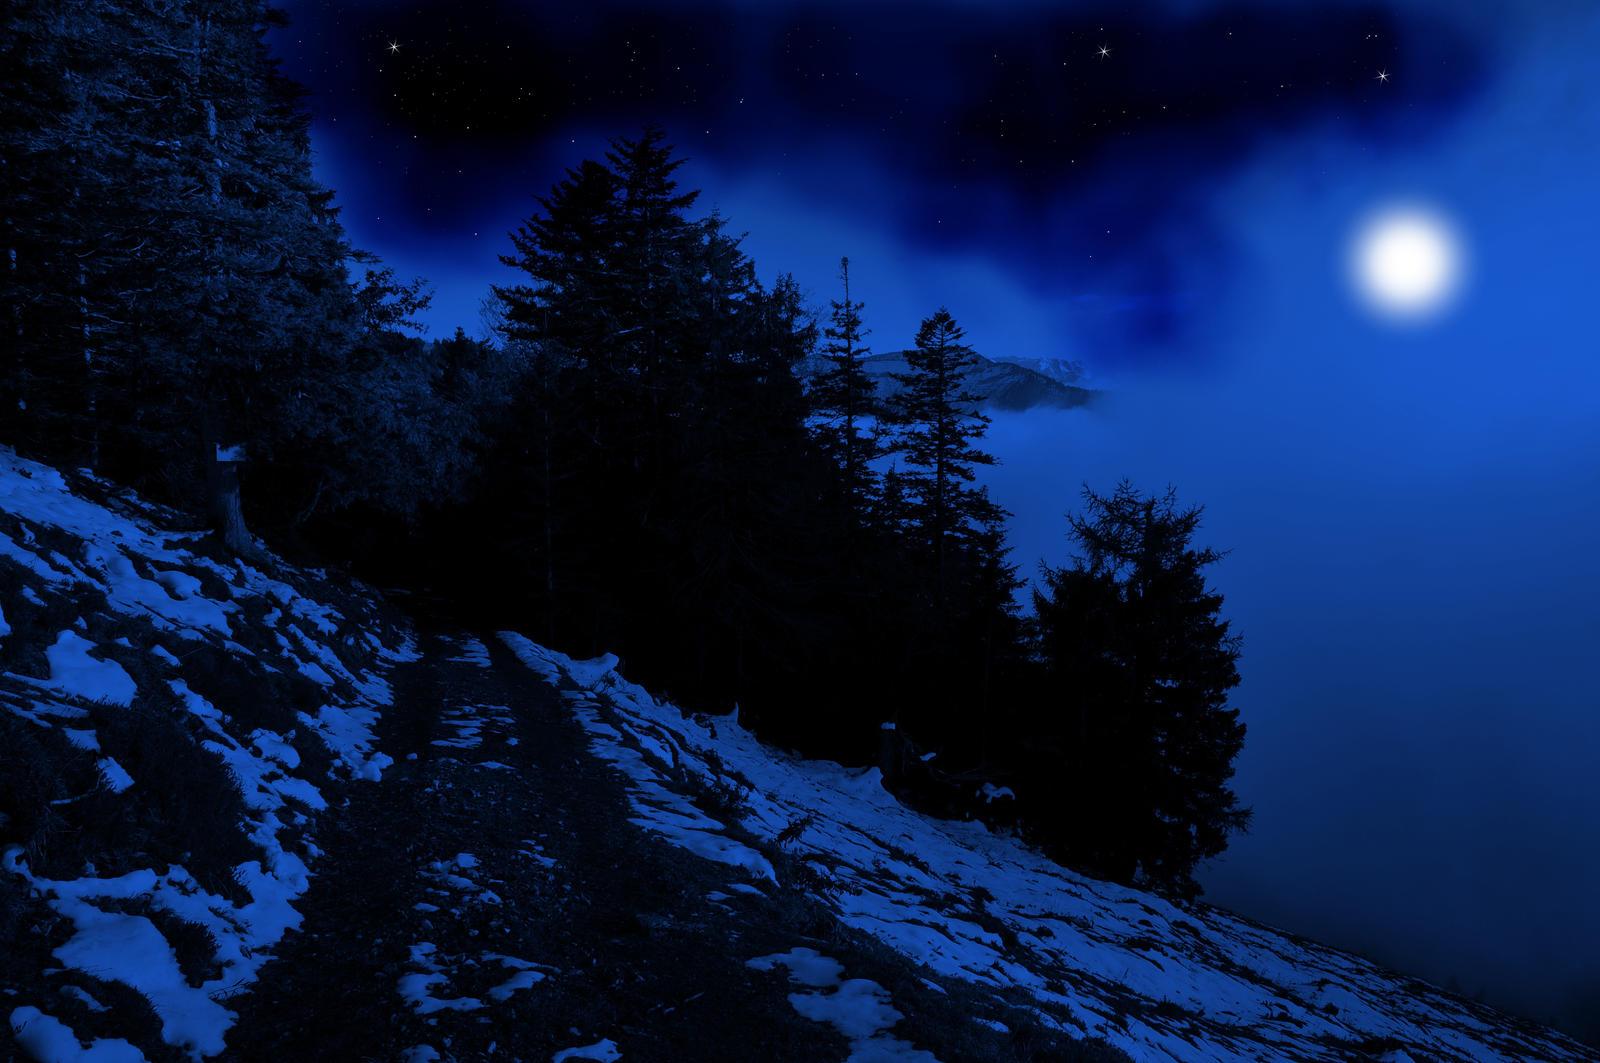 Blue Night Background